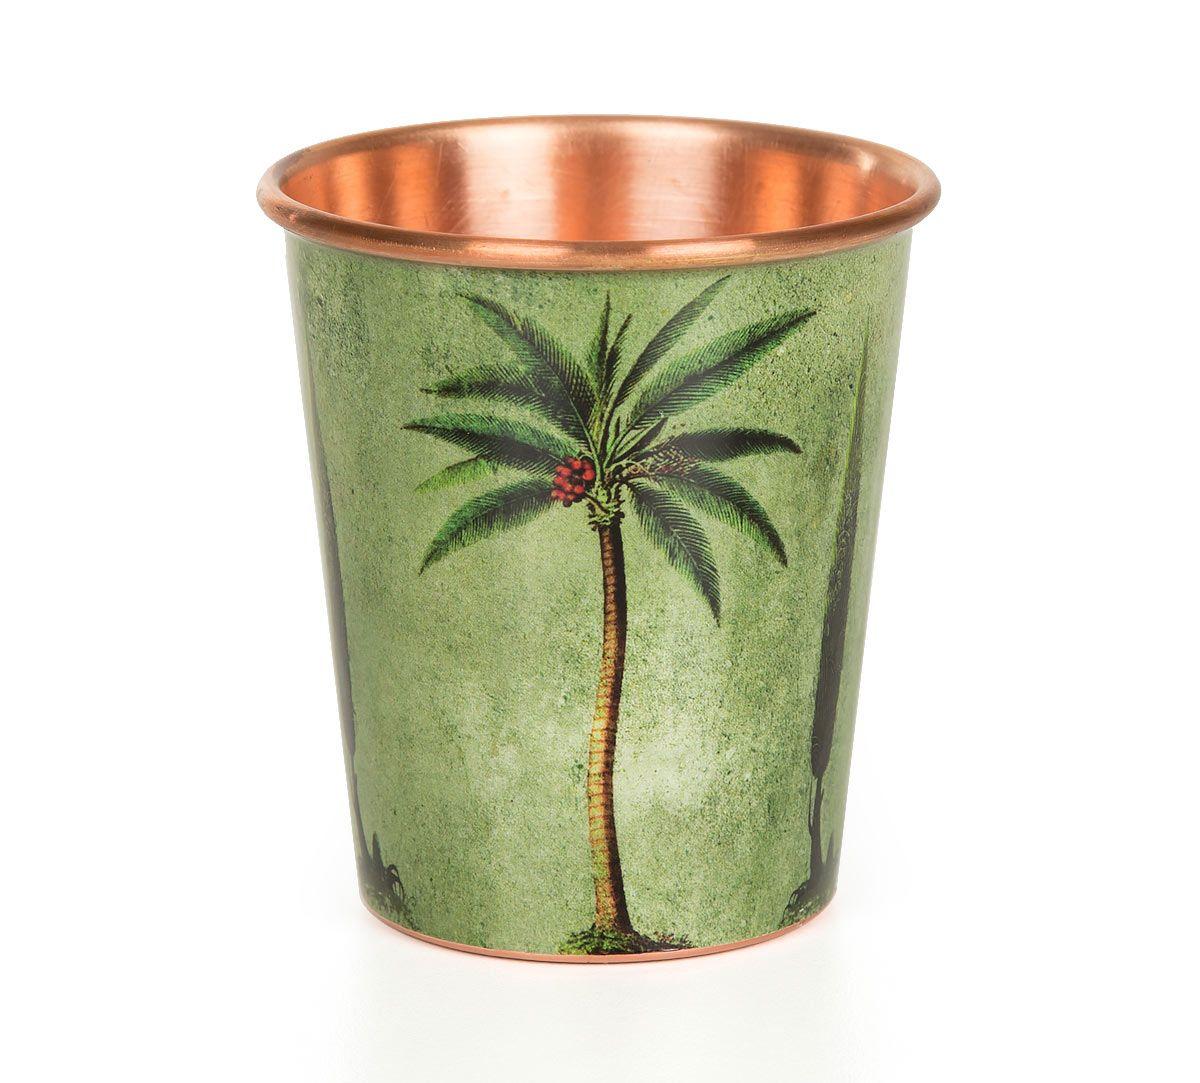 India Circus Palmeria Conifer Reiteration Small Copper Tumbler